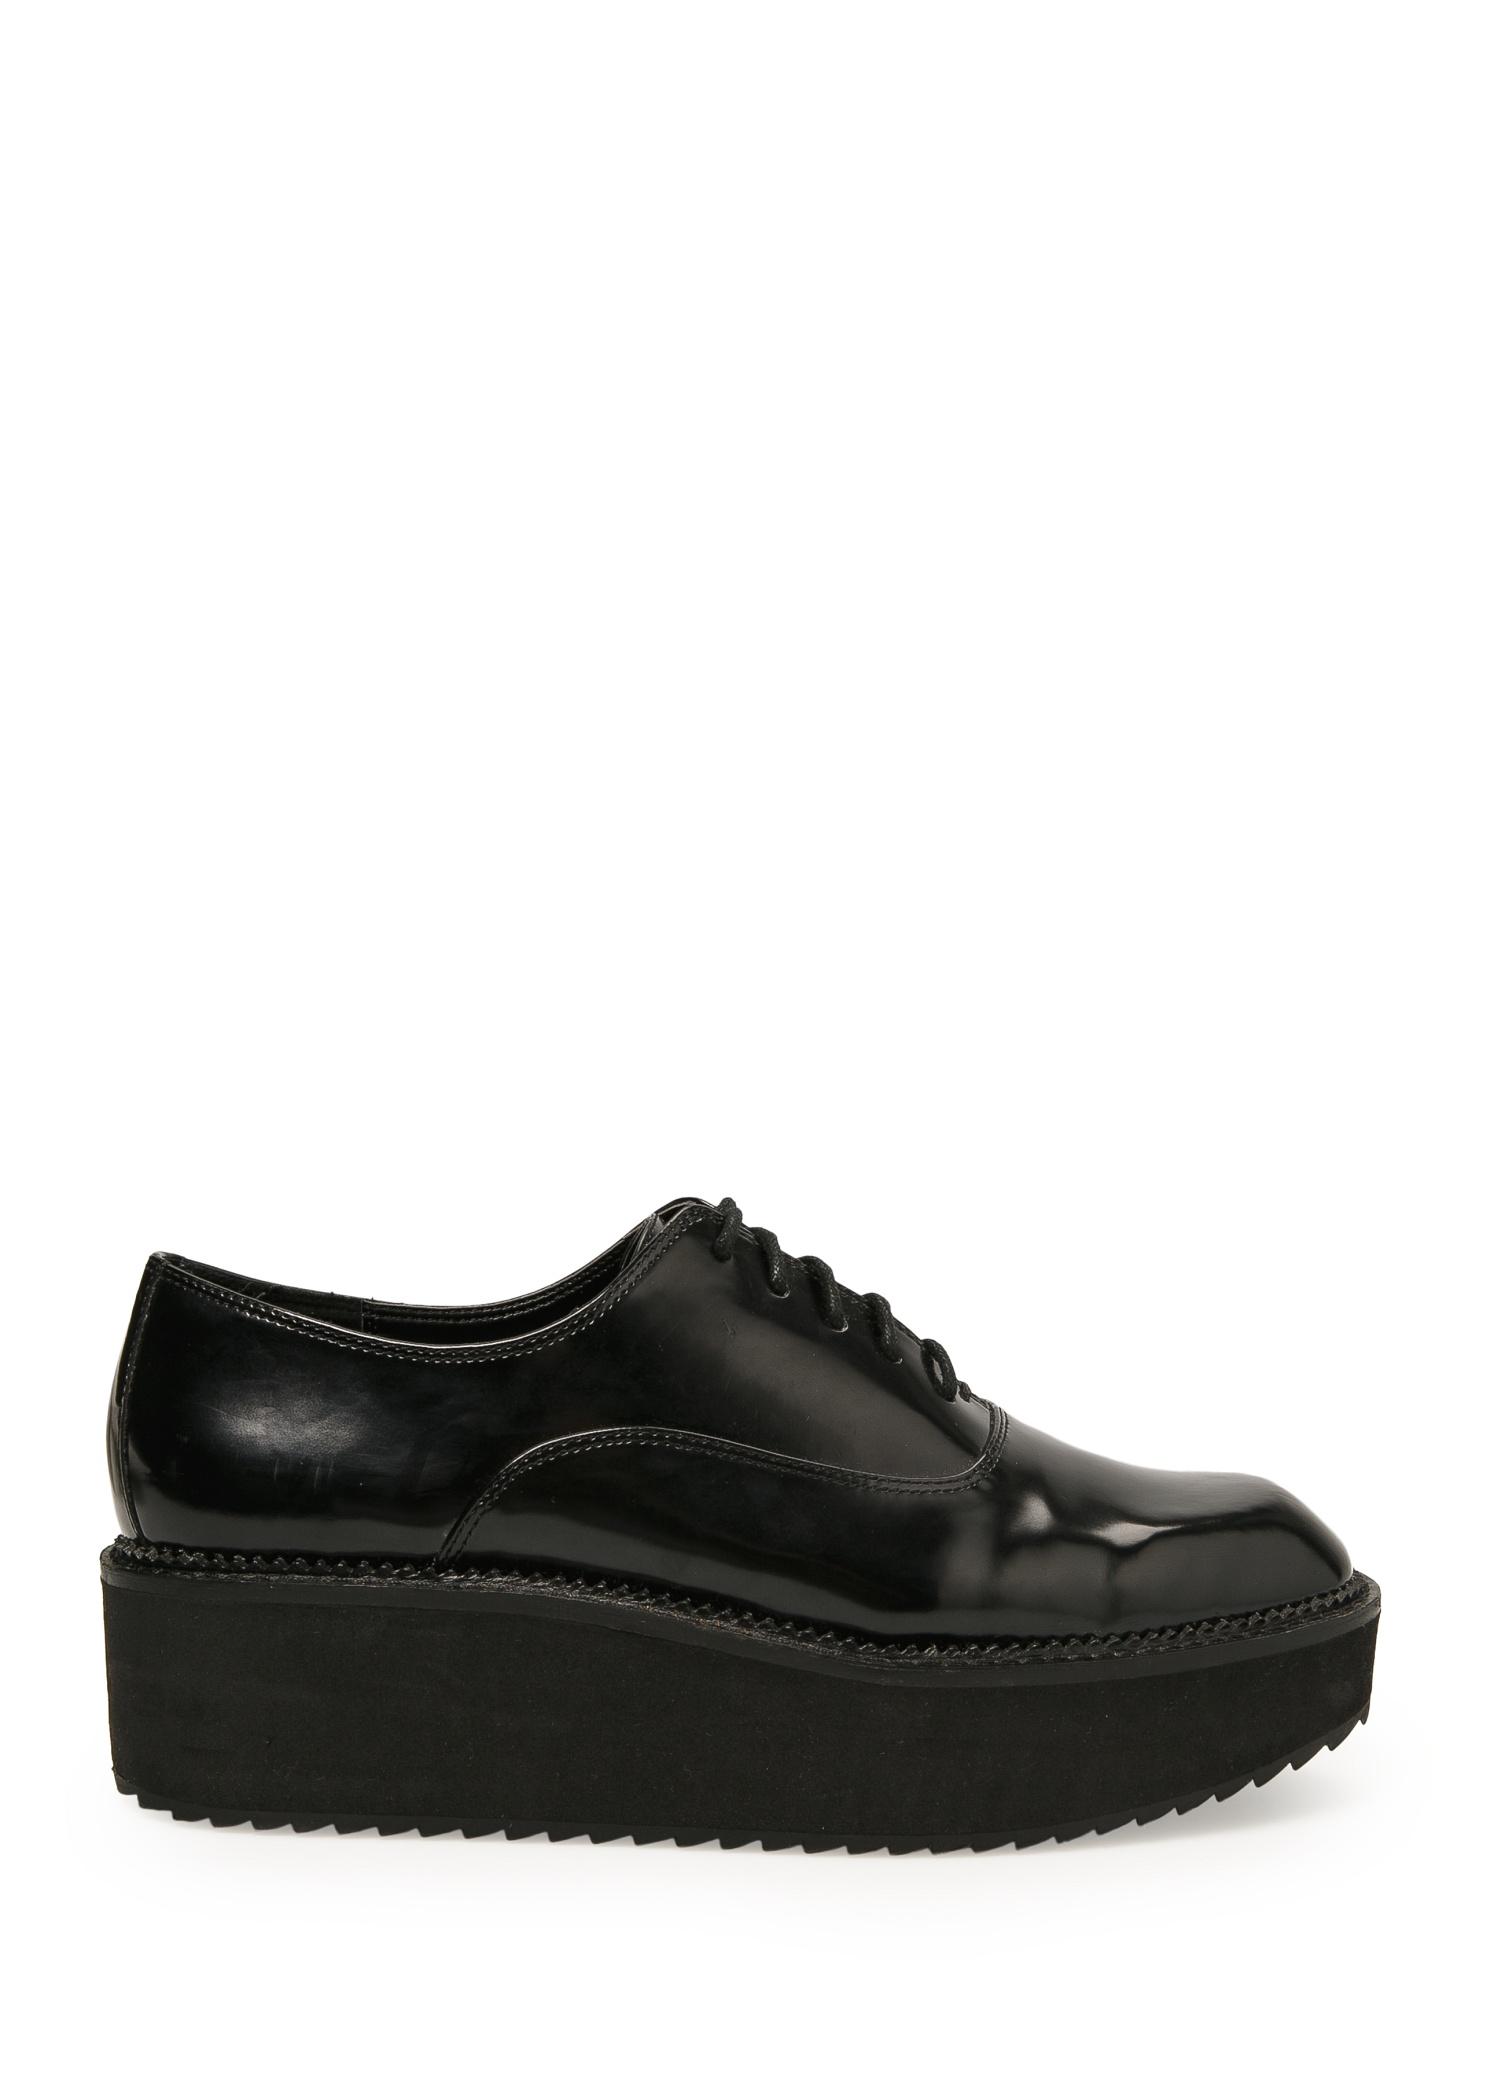 platform oxford shoes mango